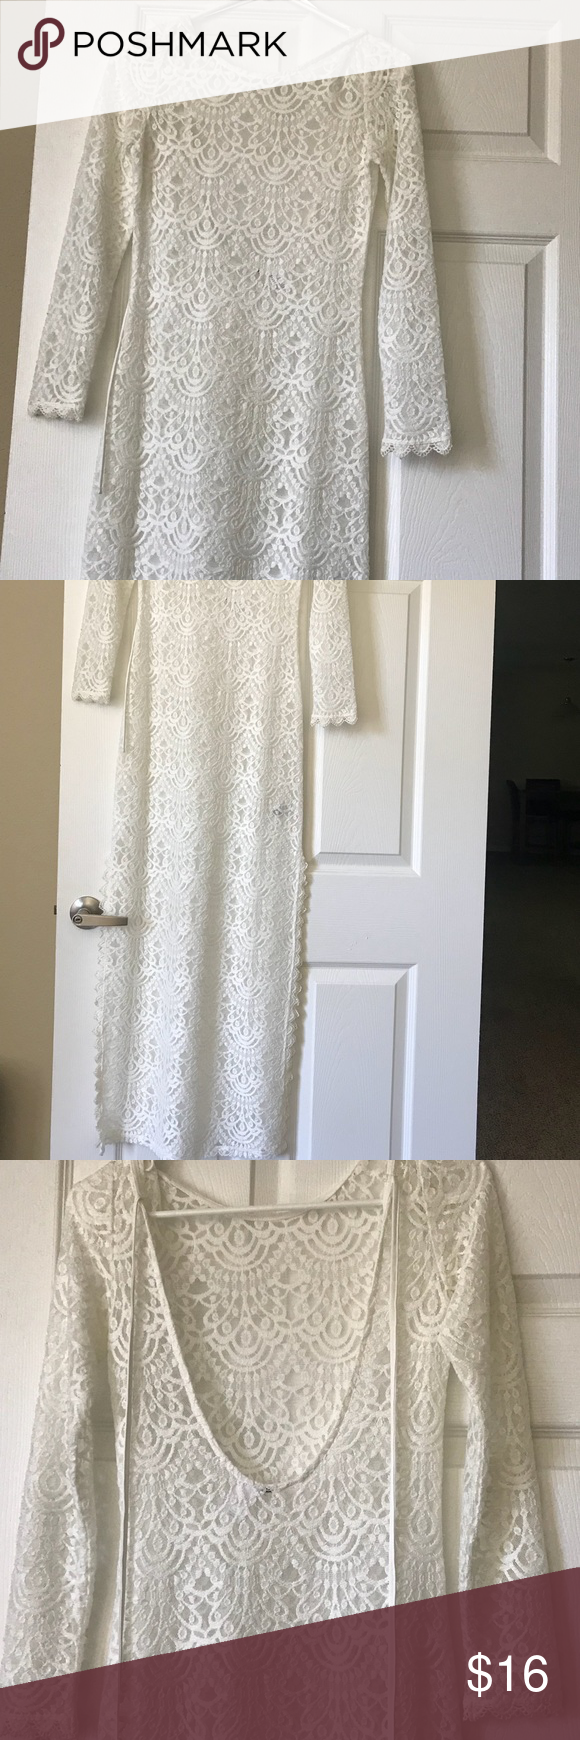 H&m lace dress white  HuM White lace dress  White lace dresses White lace and Lace dress